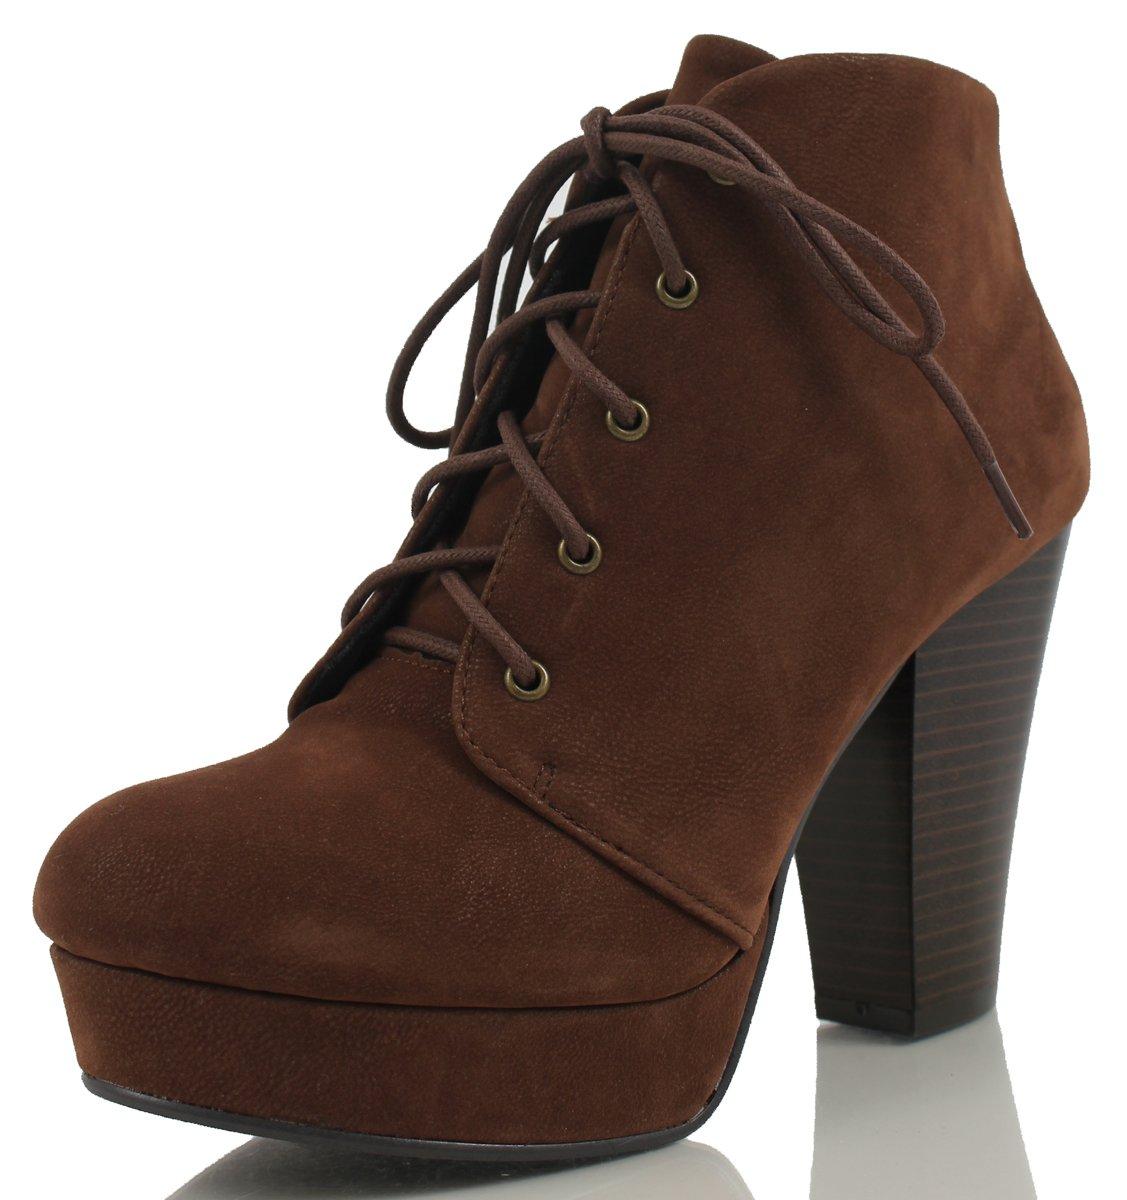 Soda Women's Agenda Ankle Lace up Platform Chunky Heel Ankle Bootie, Camel, 8 M US B012BT28V6 11 B(M) US|Chocolate